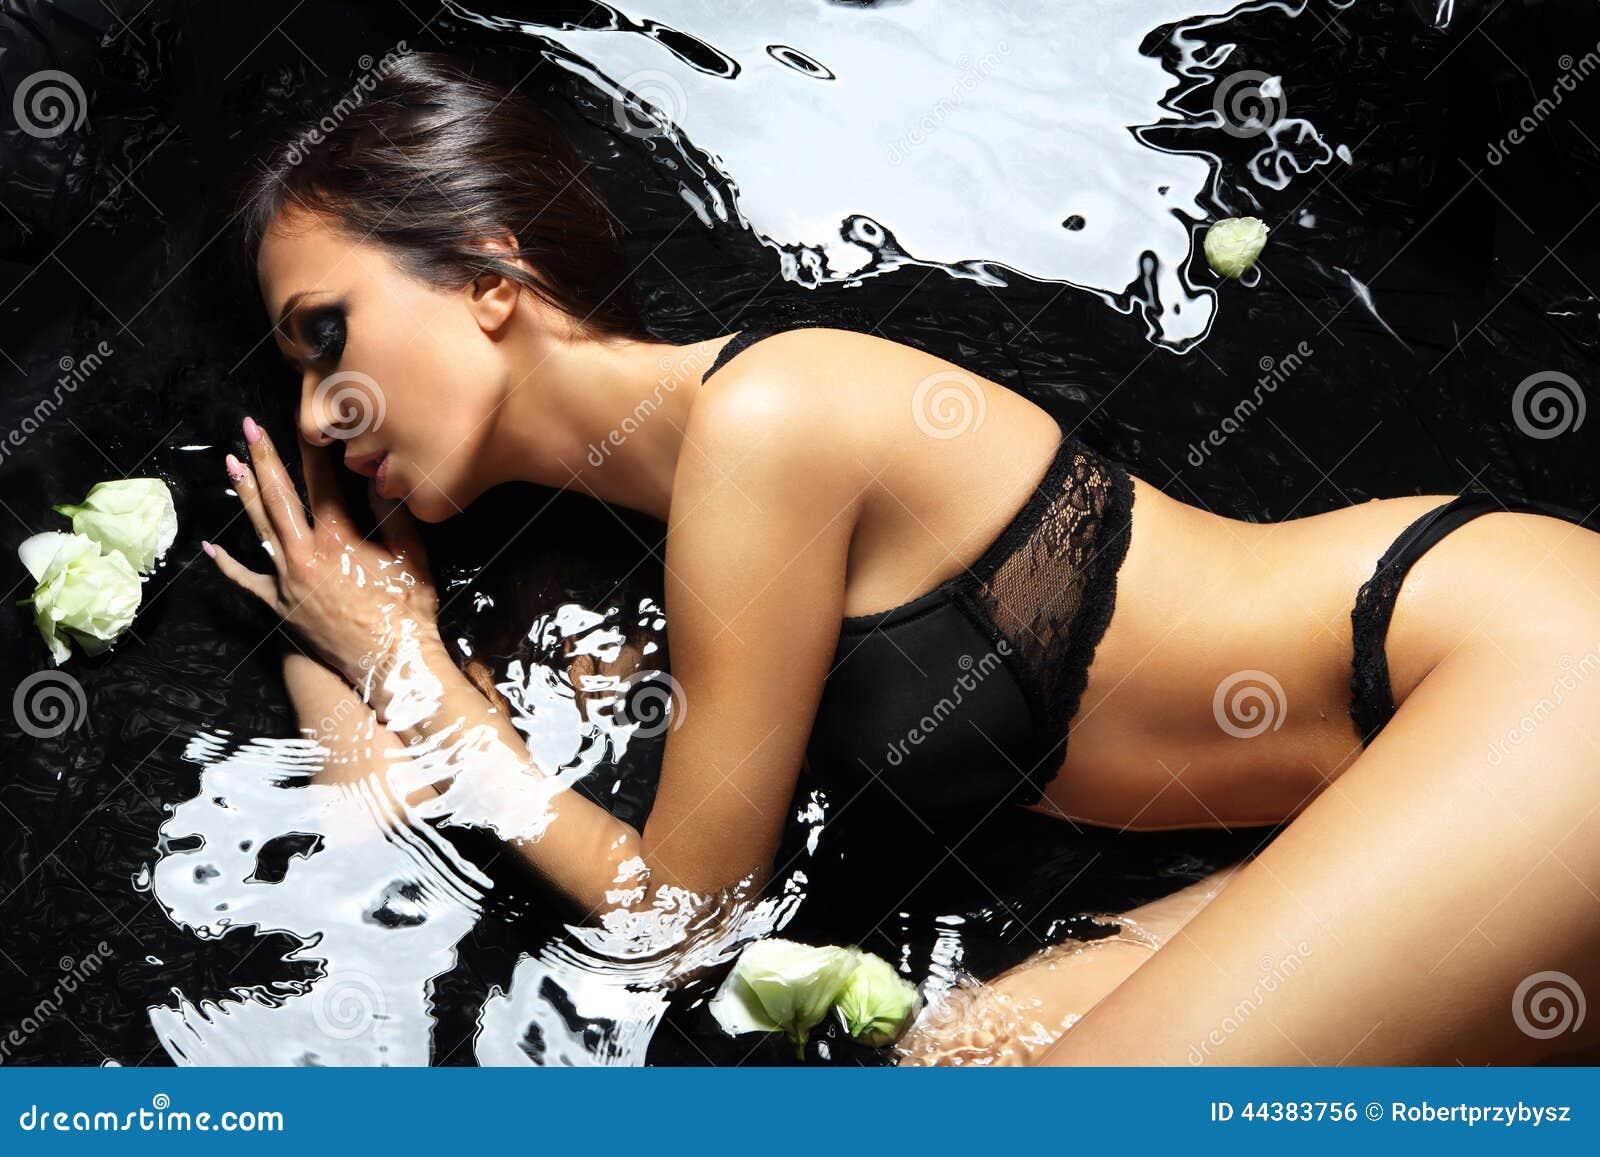 Passionate Woman In A Bath